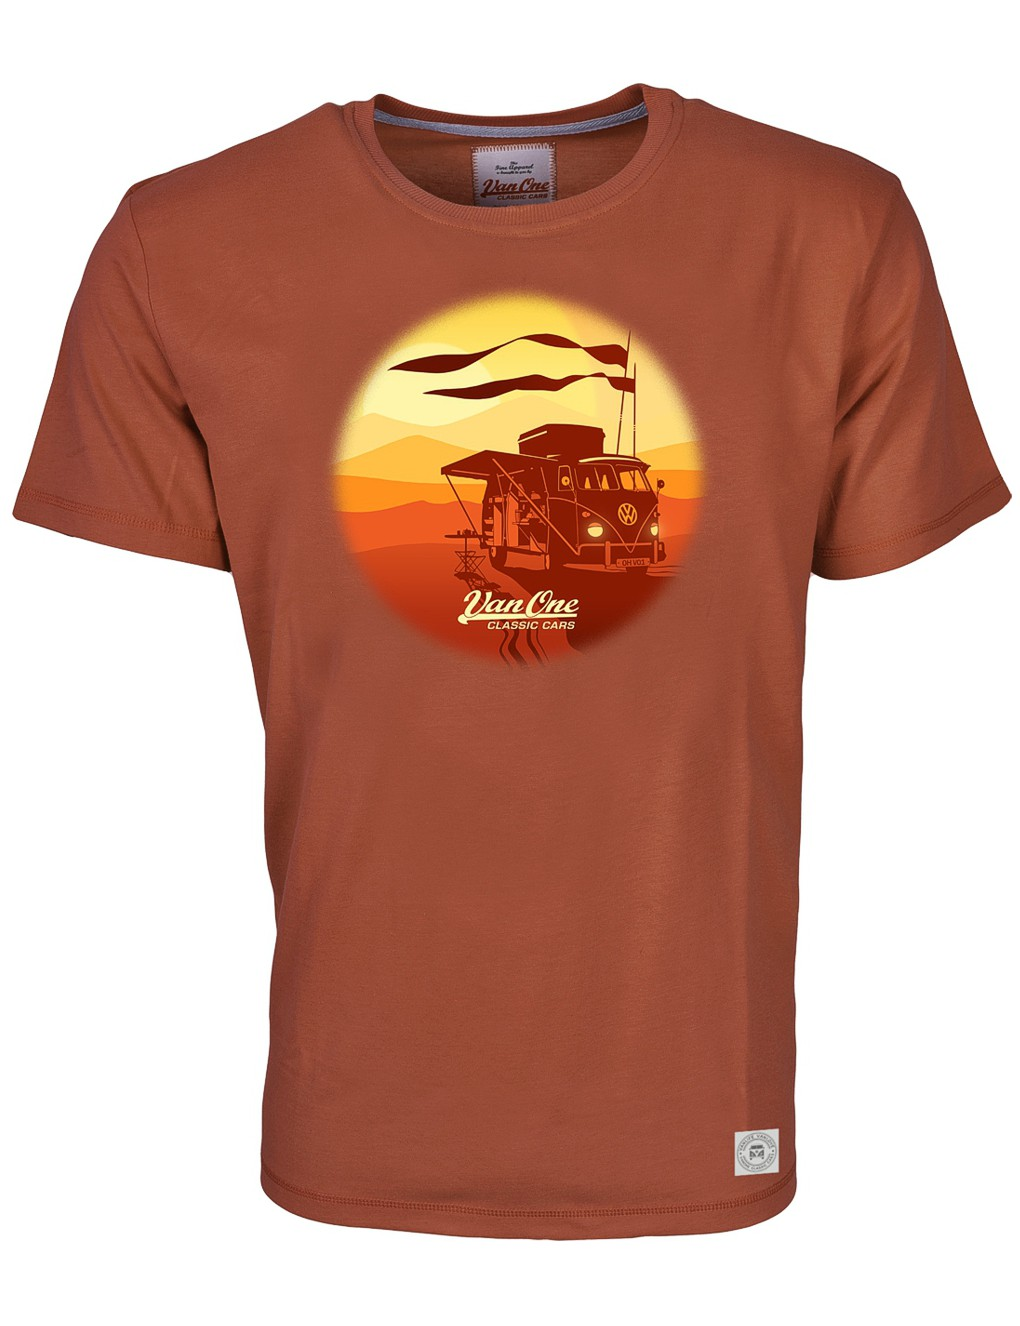 Herren T-Shirt VW Bulli »SOUL FLAGS« Braun